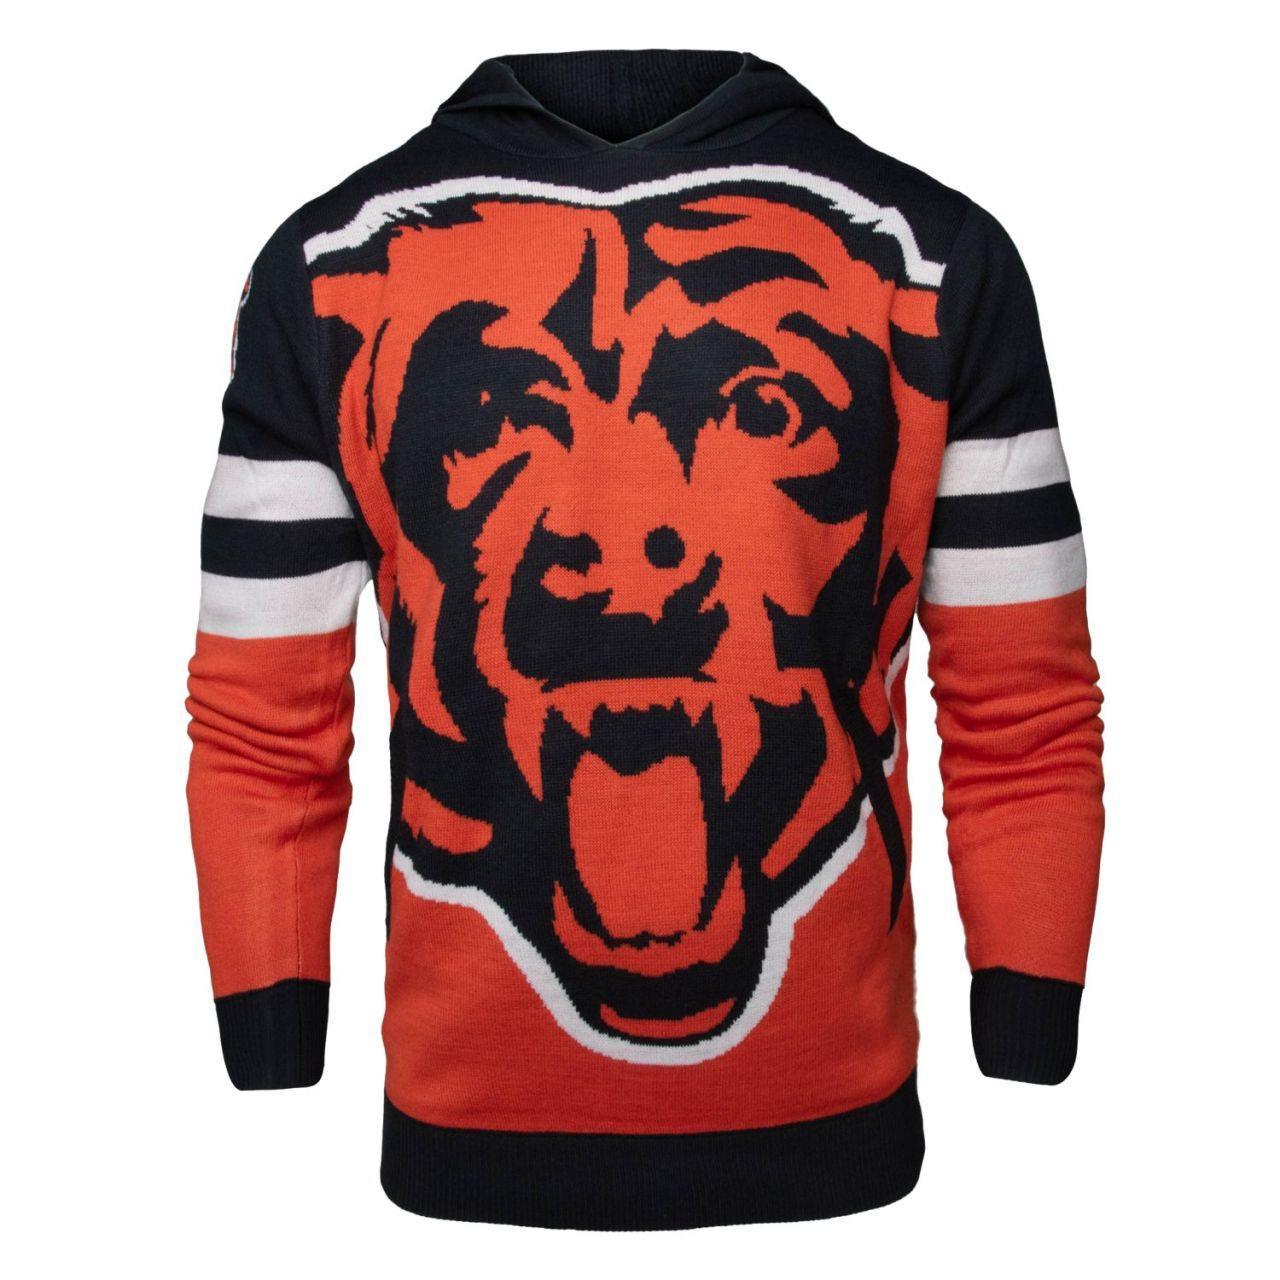 amfoo - NFL Ugly Sweater Big Logo Strick Hoody - Chicago Bears